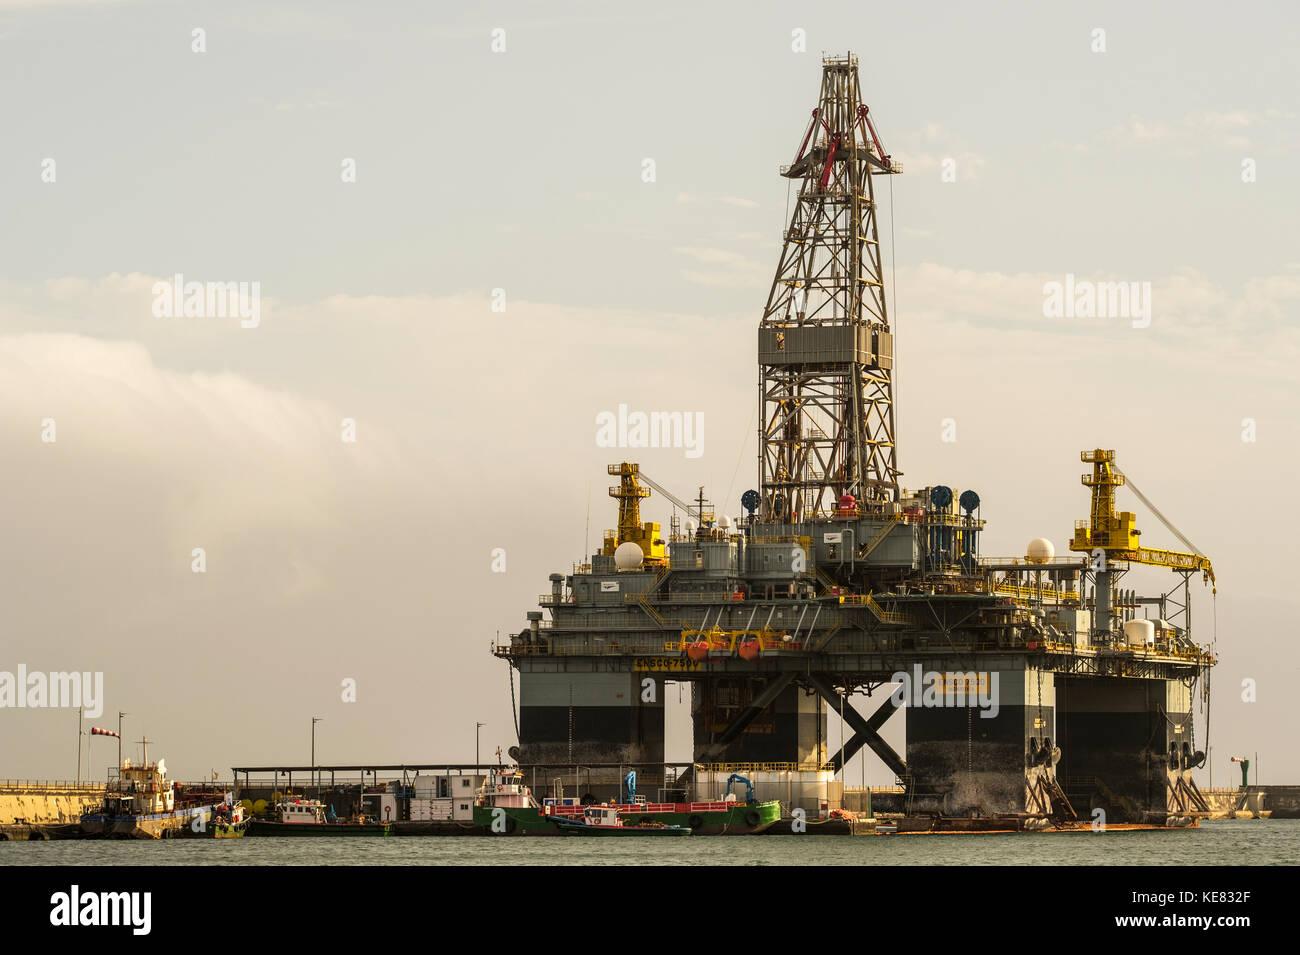 Ensco 7500 Drilling Platform, Santa Cruz Harbour; Santa Cruz, Tenerife, Canary Islands, Spain Stock Photo